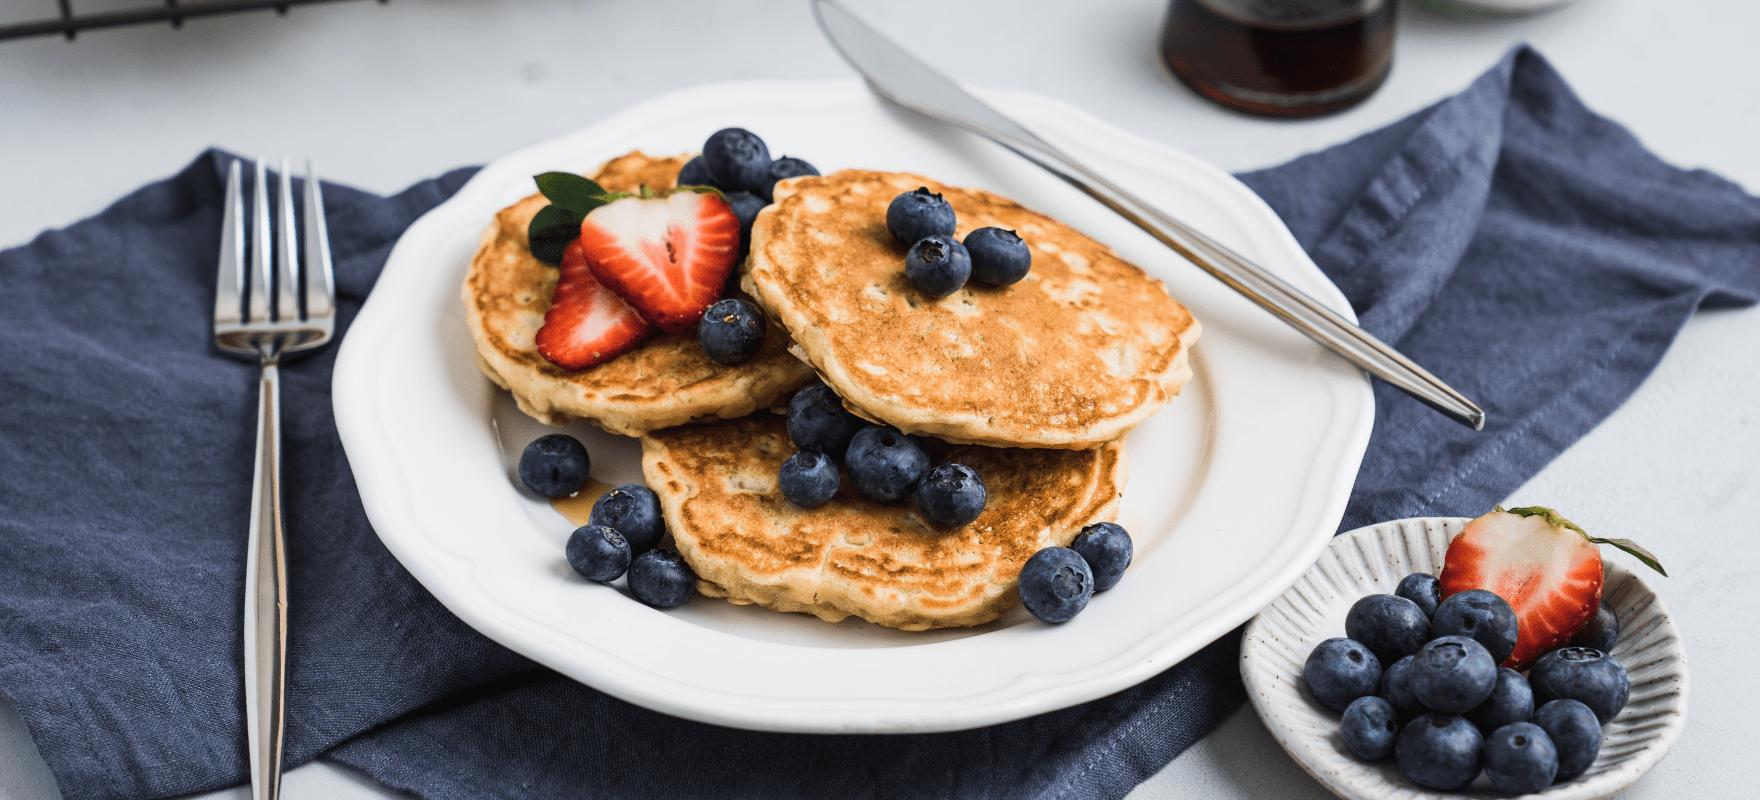 Oat pancakes image 1